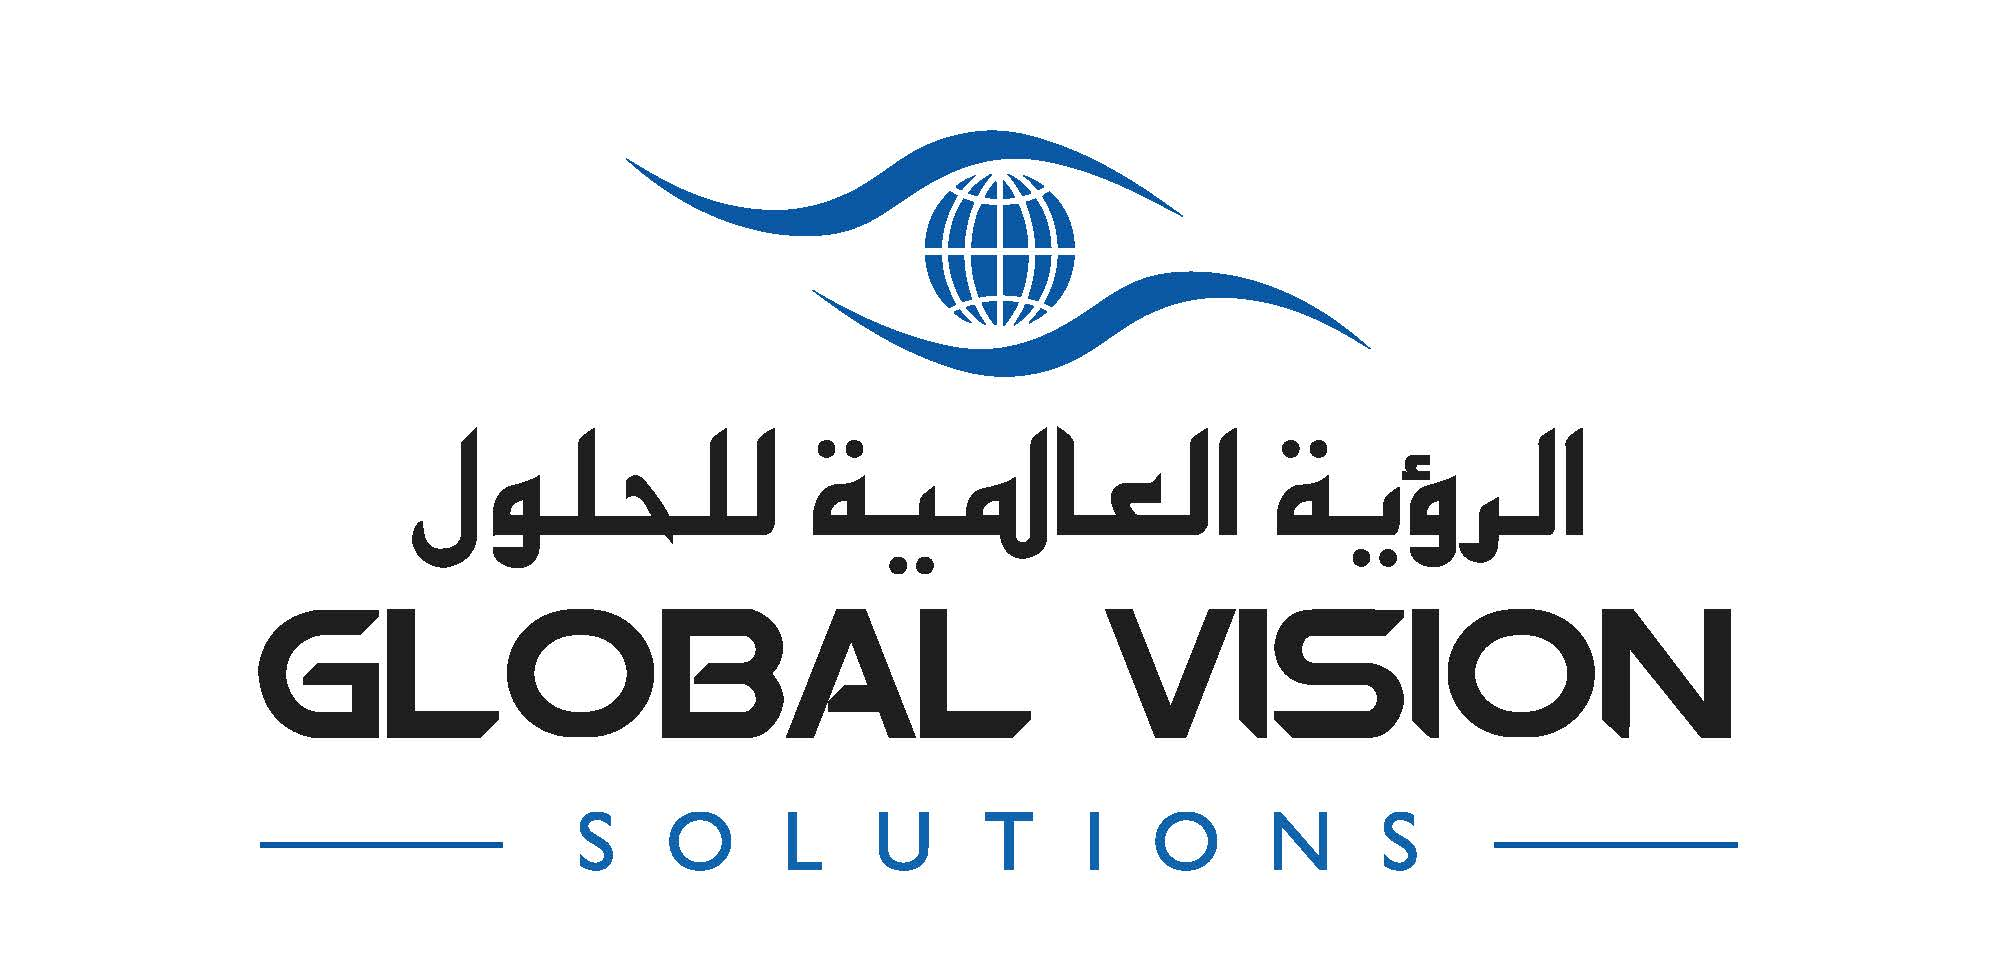 Global Vision Solution